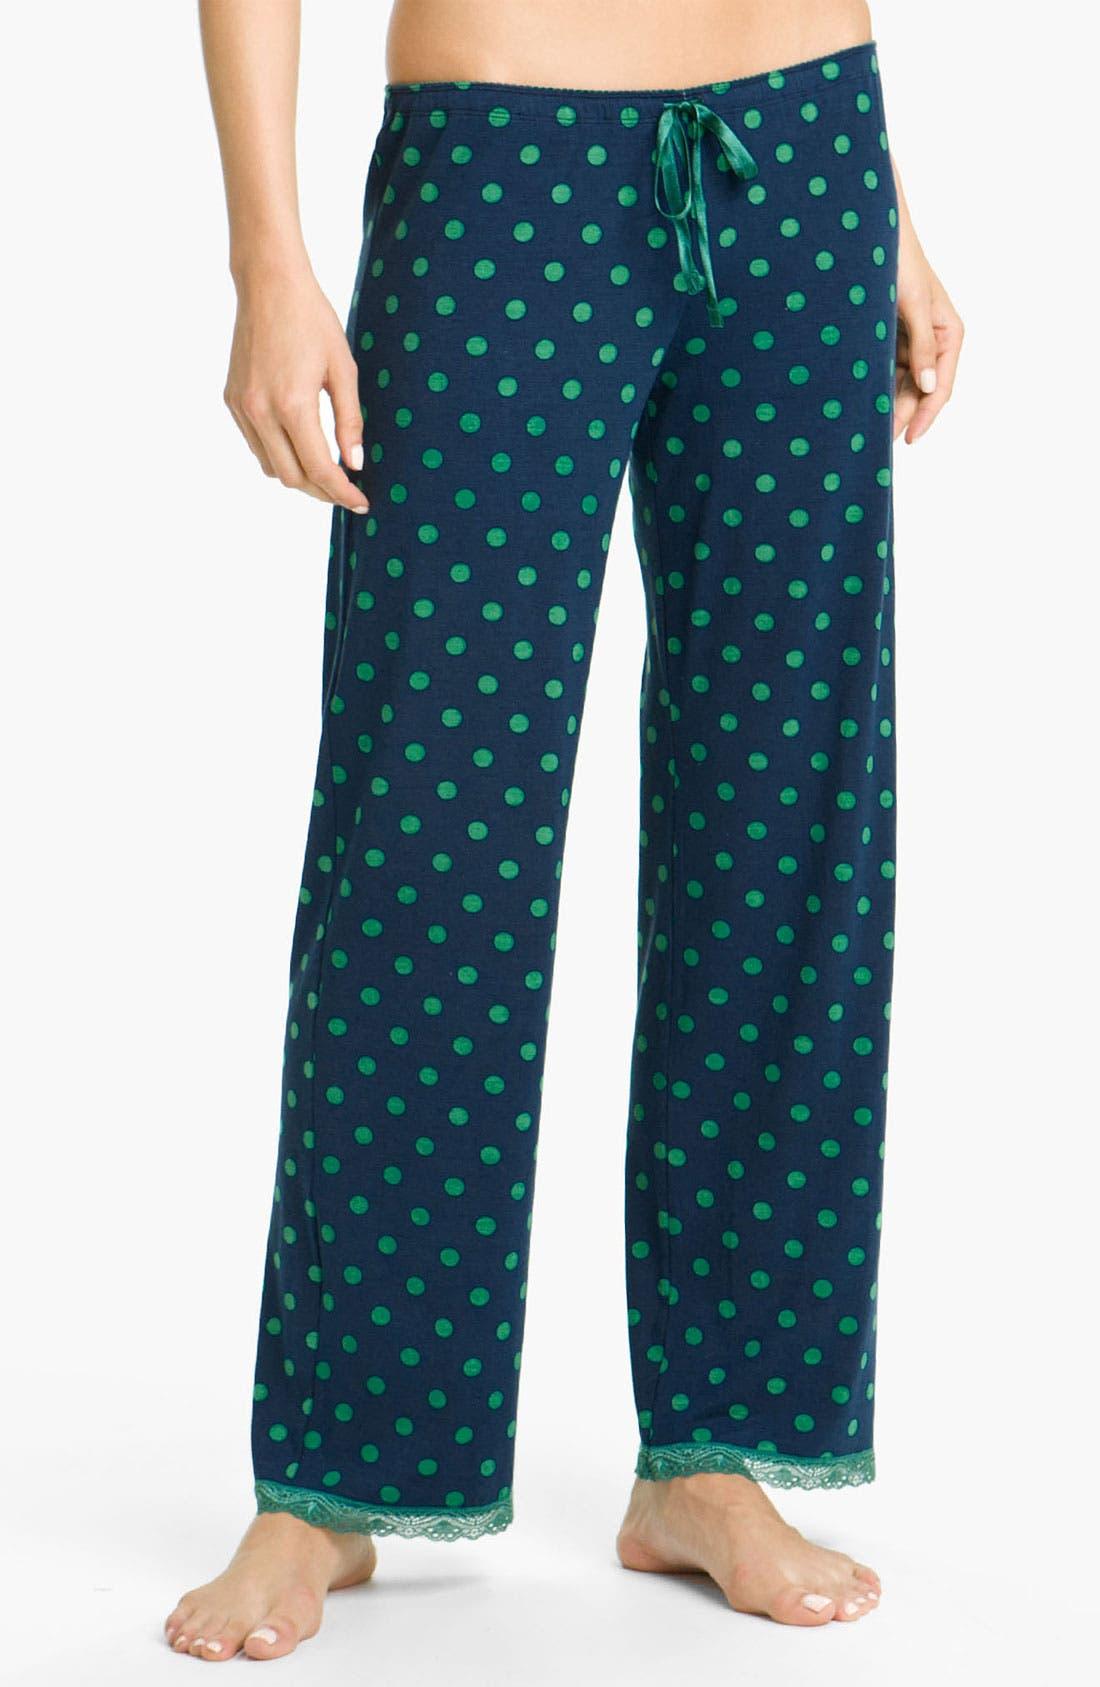 Alternate Image 1 Selected - PJ Salvage 'Emerald City' Knit Lounge Pants